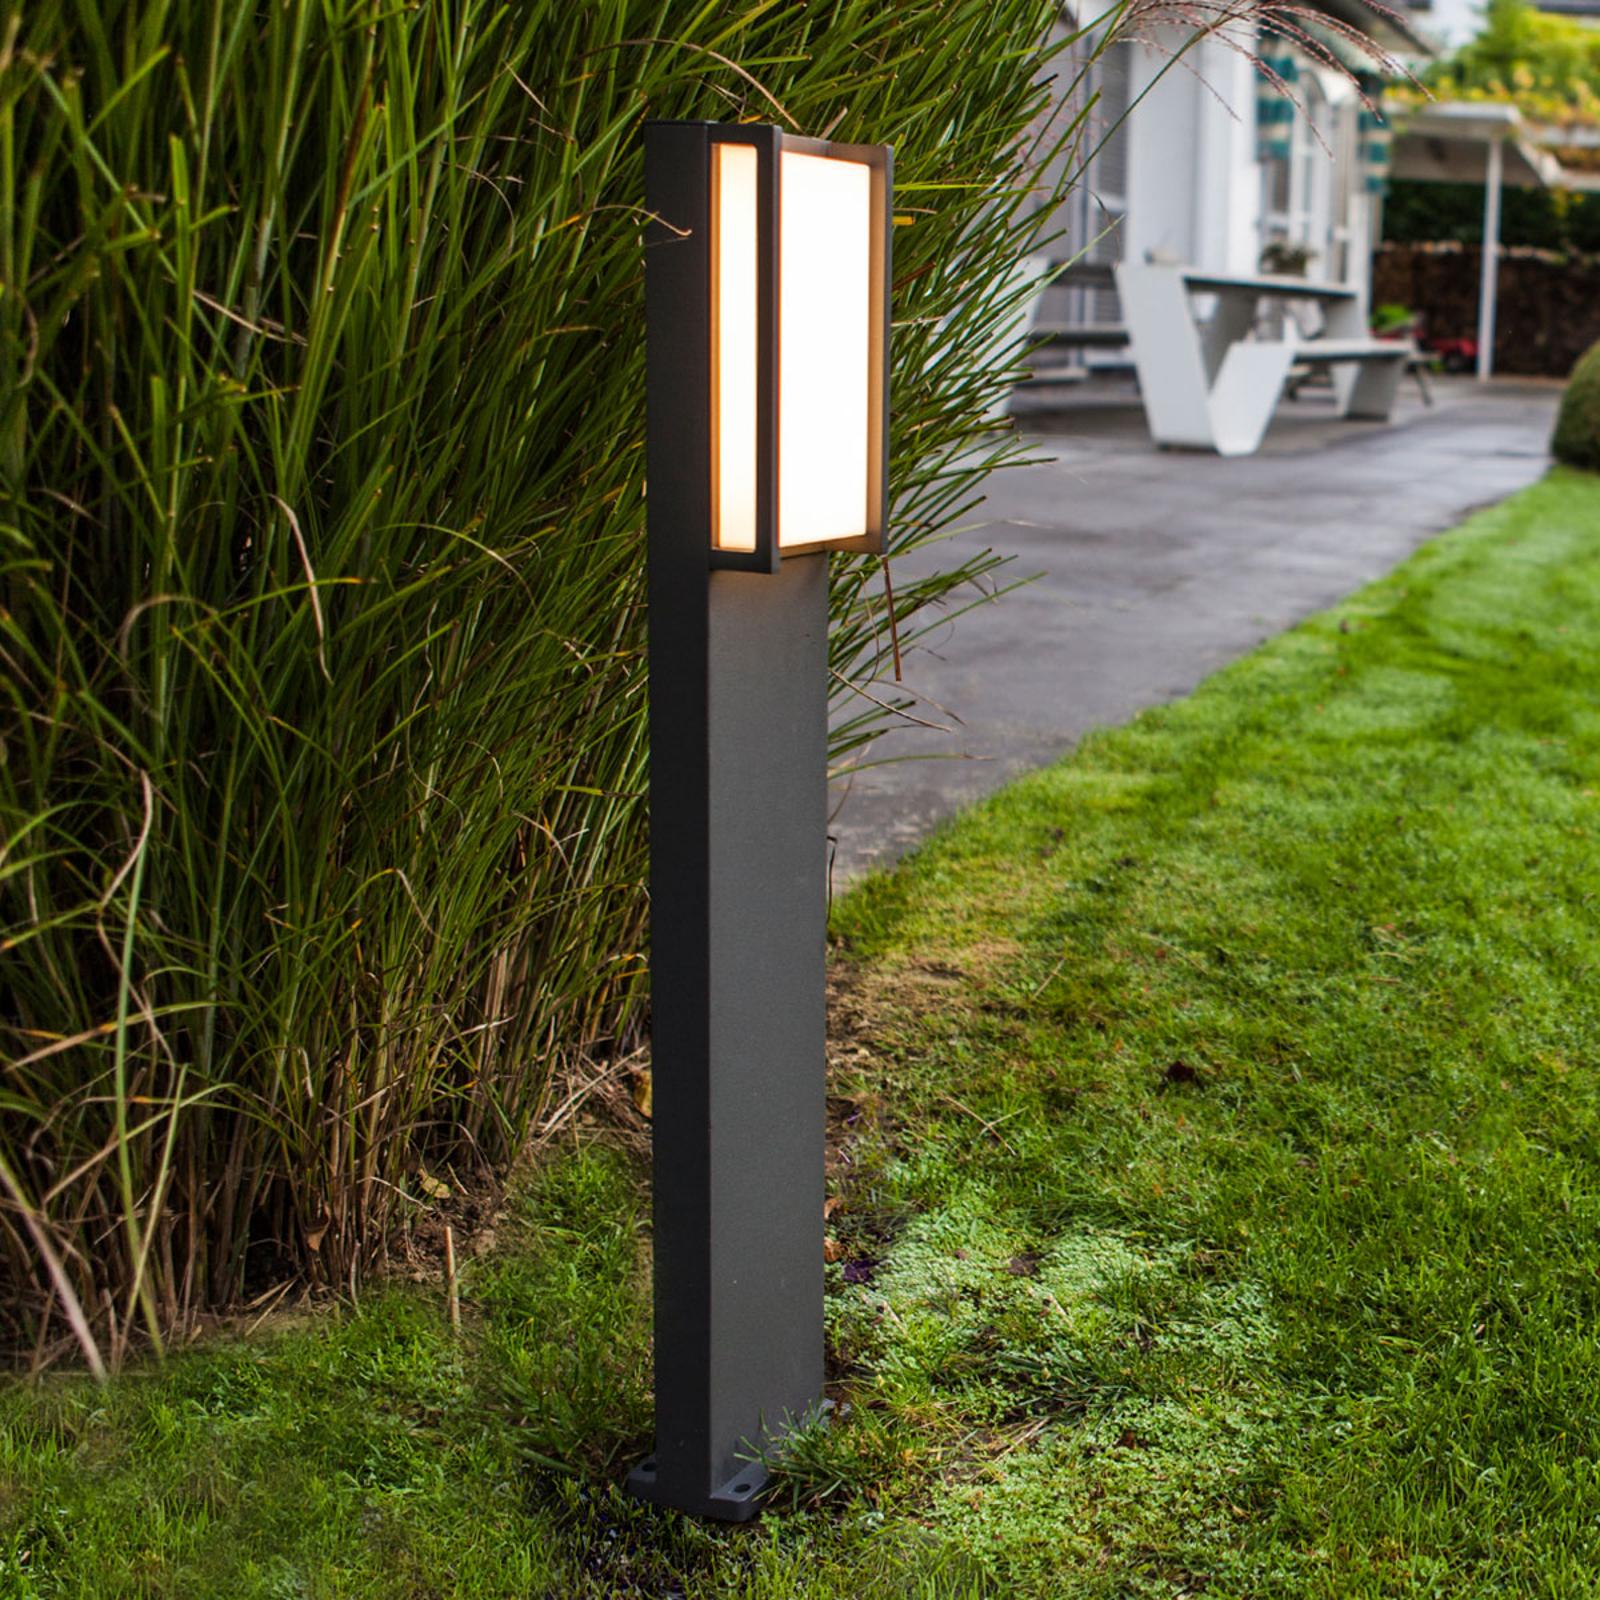 Qubo - LED tuinpadverlichting in rechte vorm